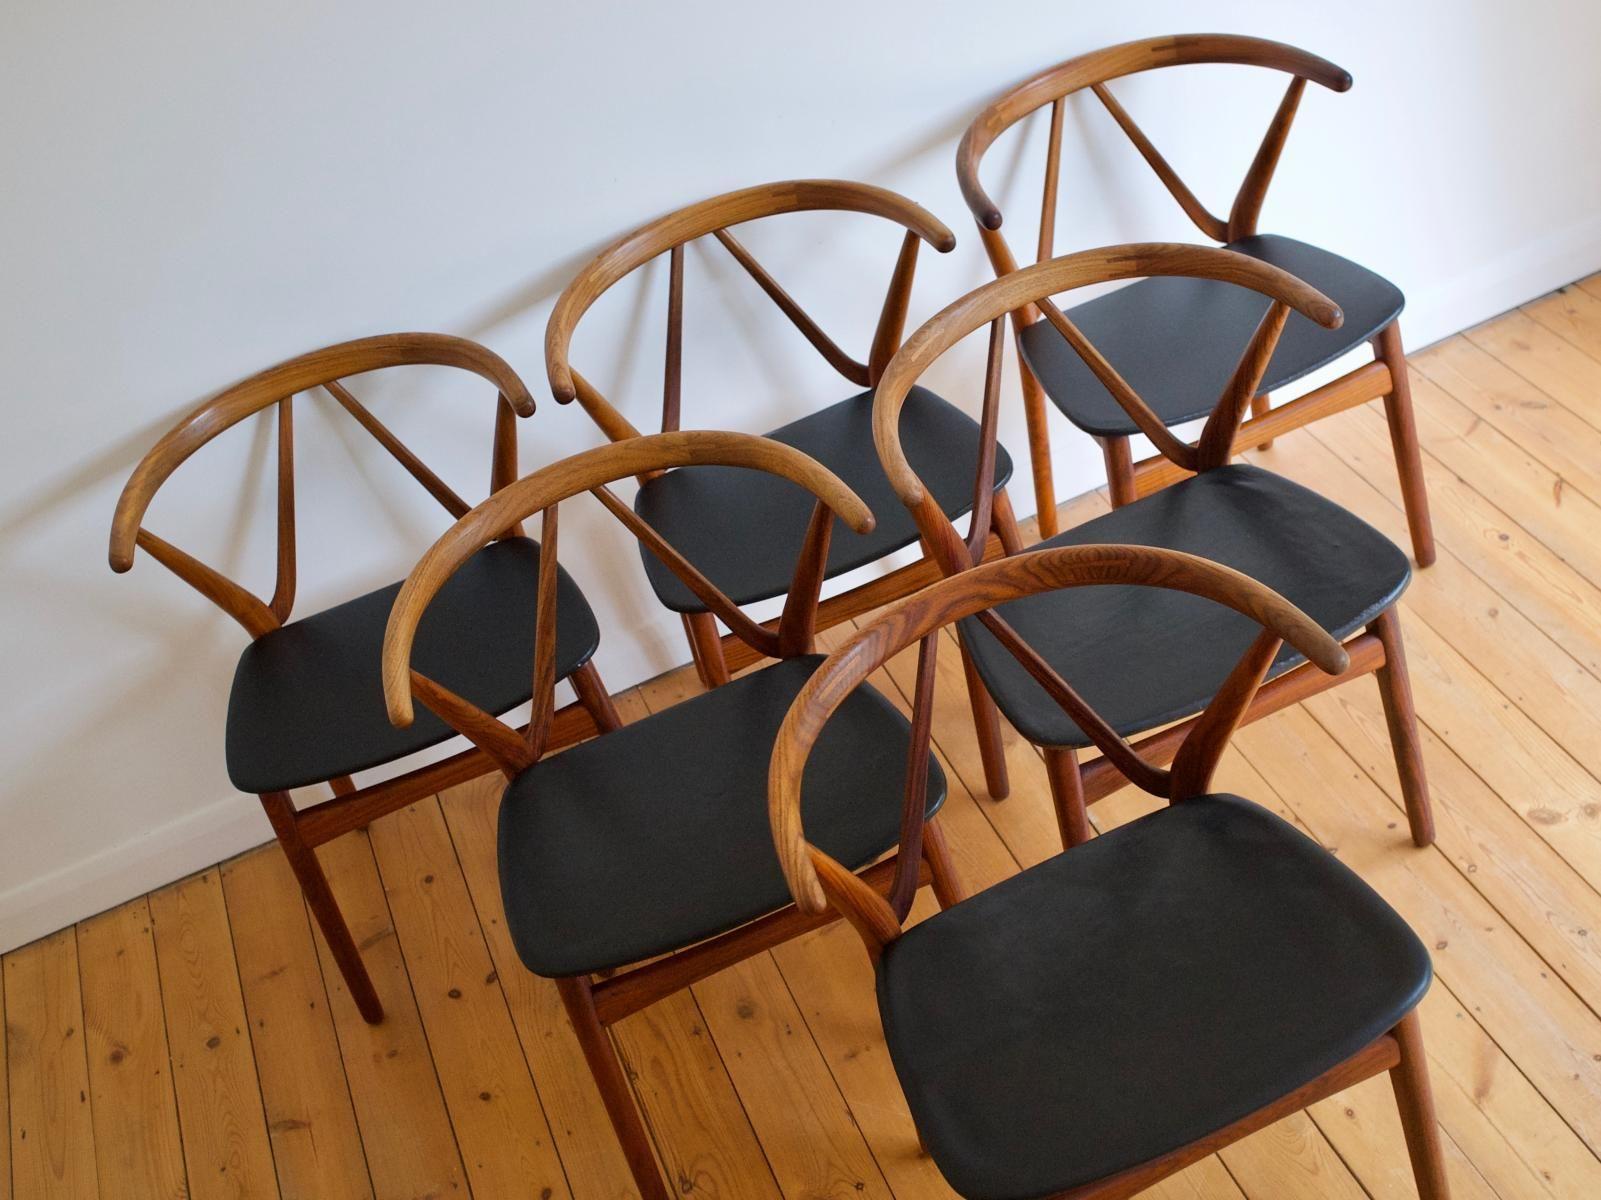 Rosewood Chairs by Henning Kjærnulf for Bruno Hansen